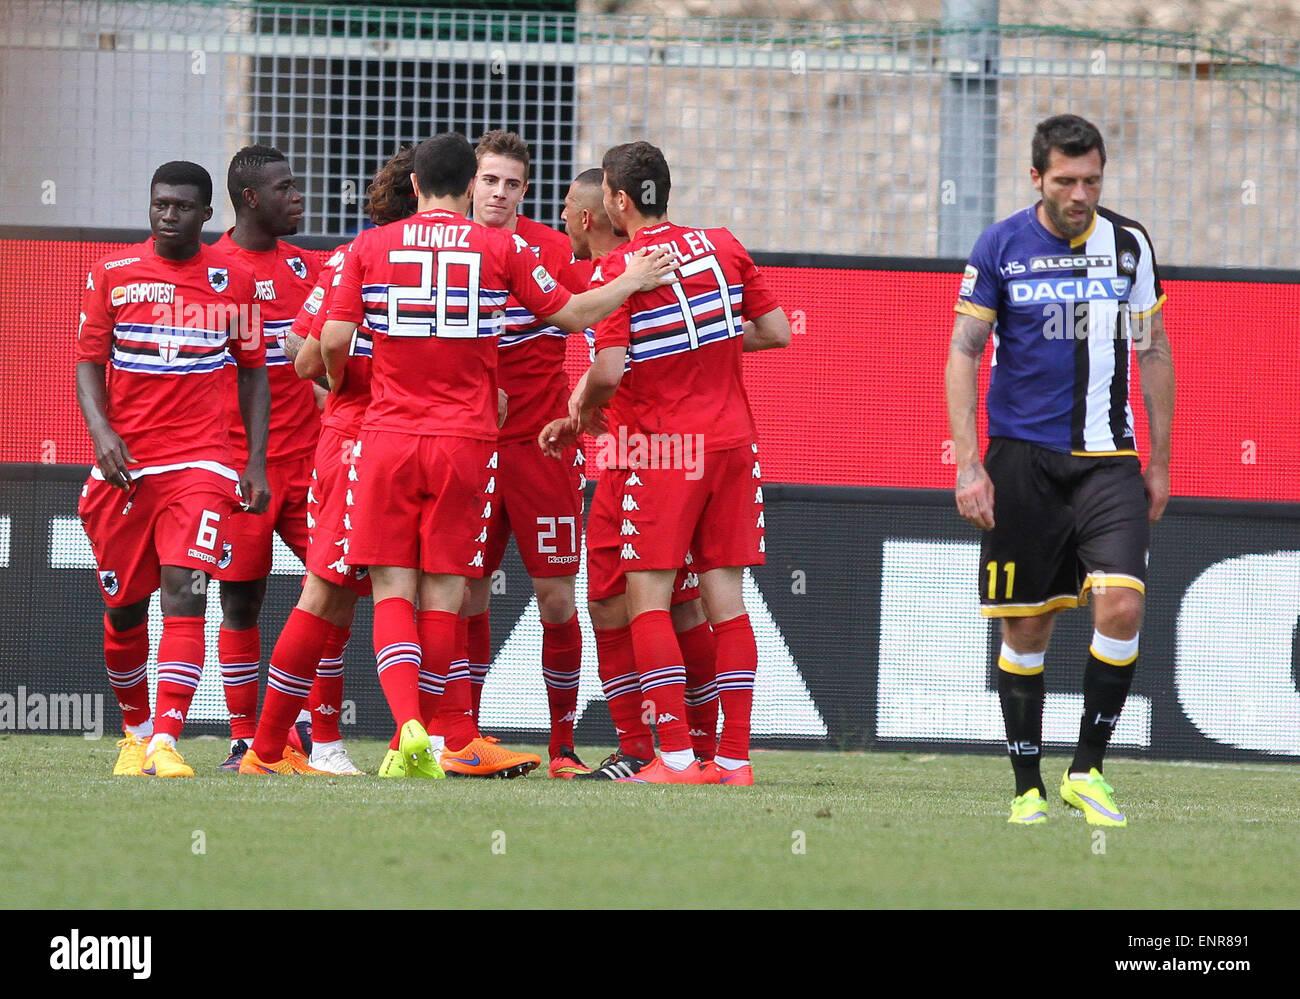 ITALY, Udine: Sampdoria's midfielder Roberto celebrates after scoring a goal 0-2 with teammates during the Italian - Stock Image